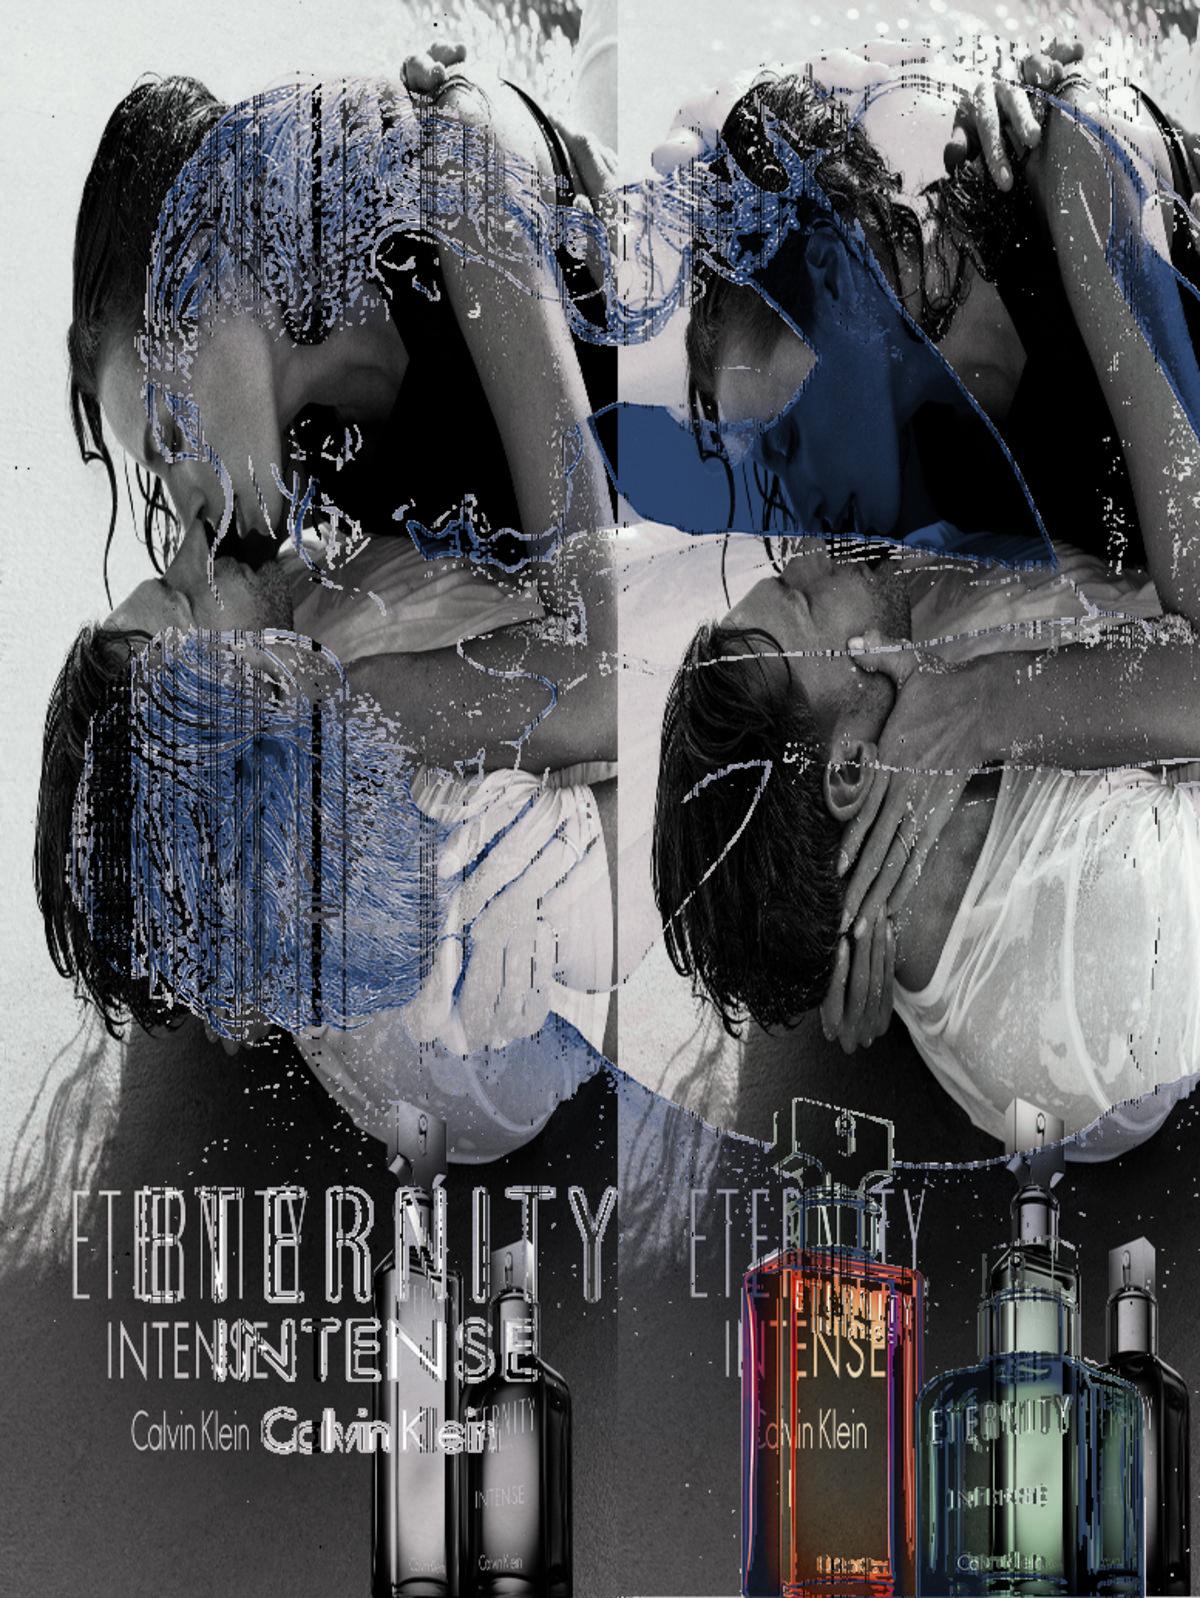 Nowy zapach od Calvina Kleina: Eternity Intense Women, Men ceny